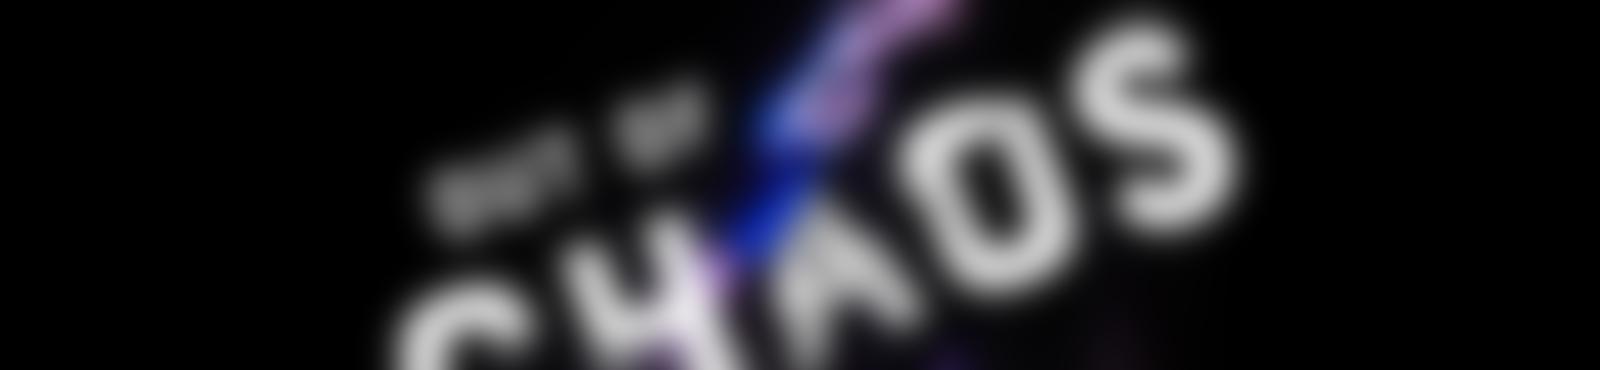 Blurred cdee0e92 6049 4784 a4e7 fe756213f131